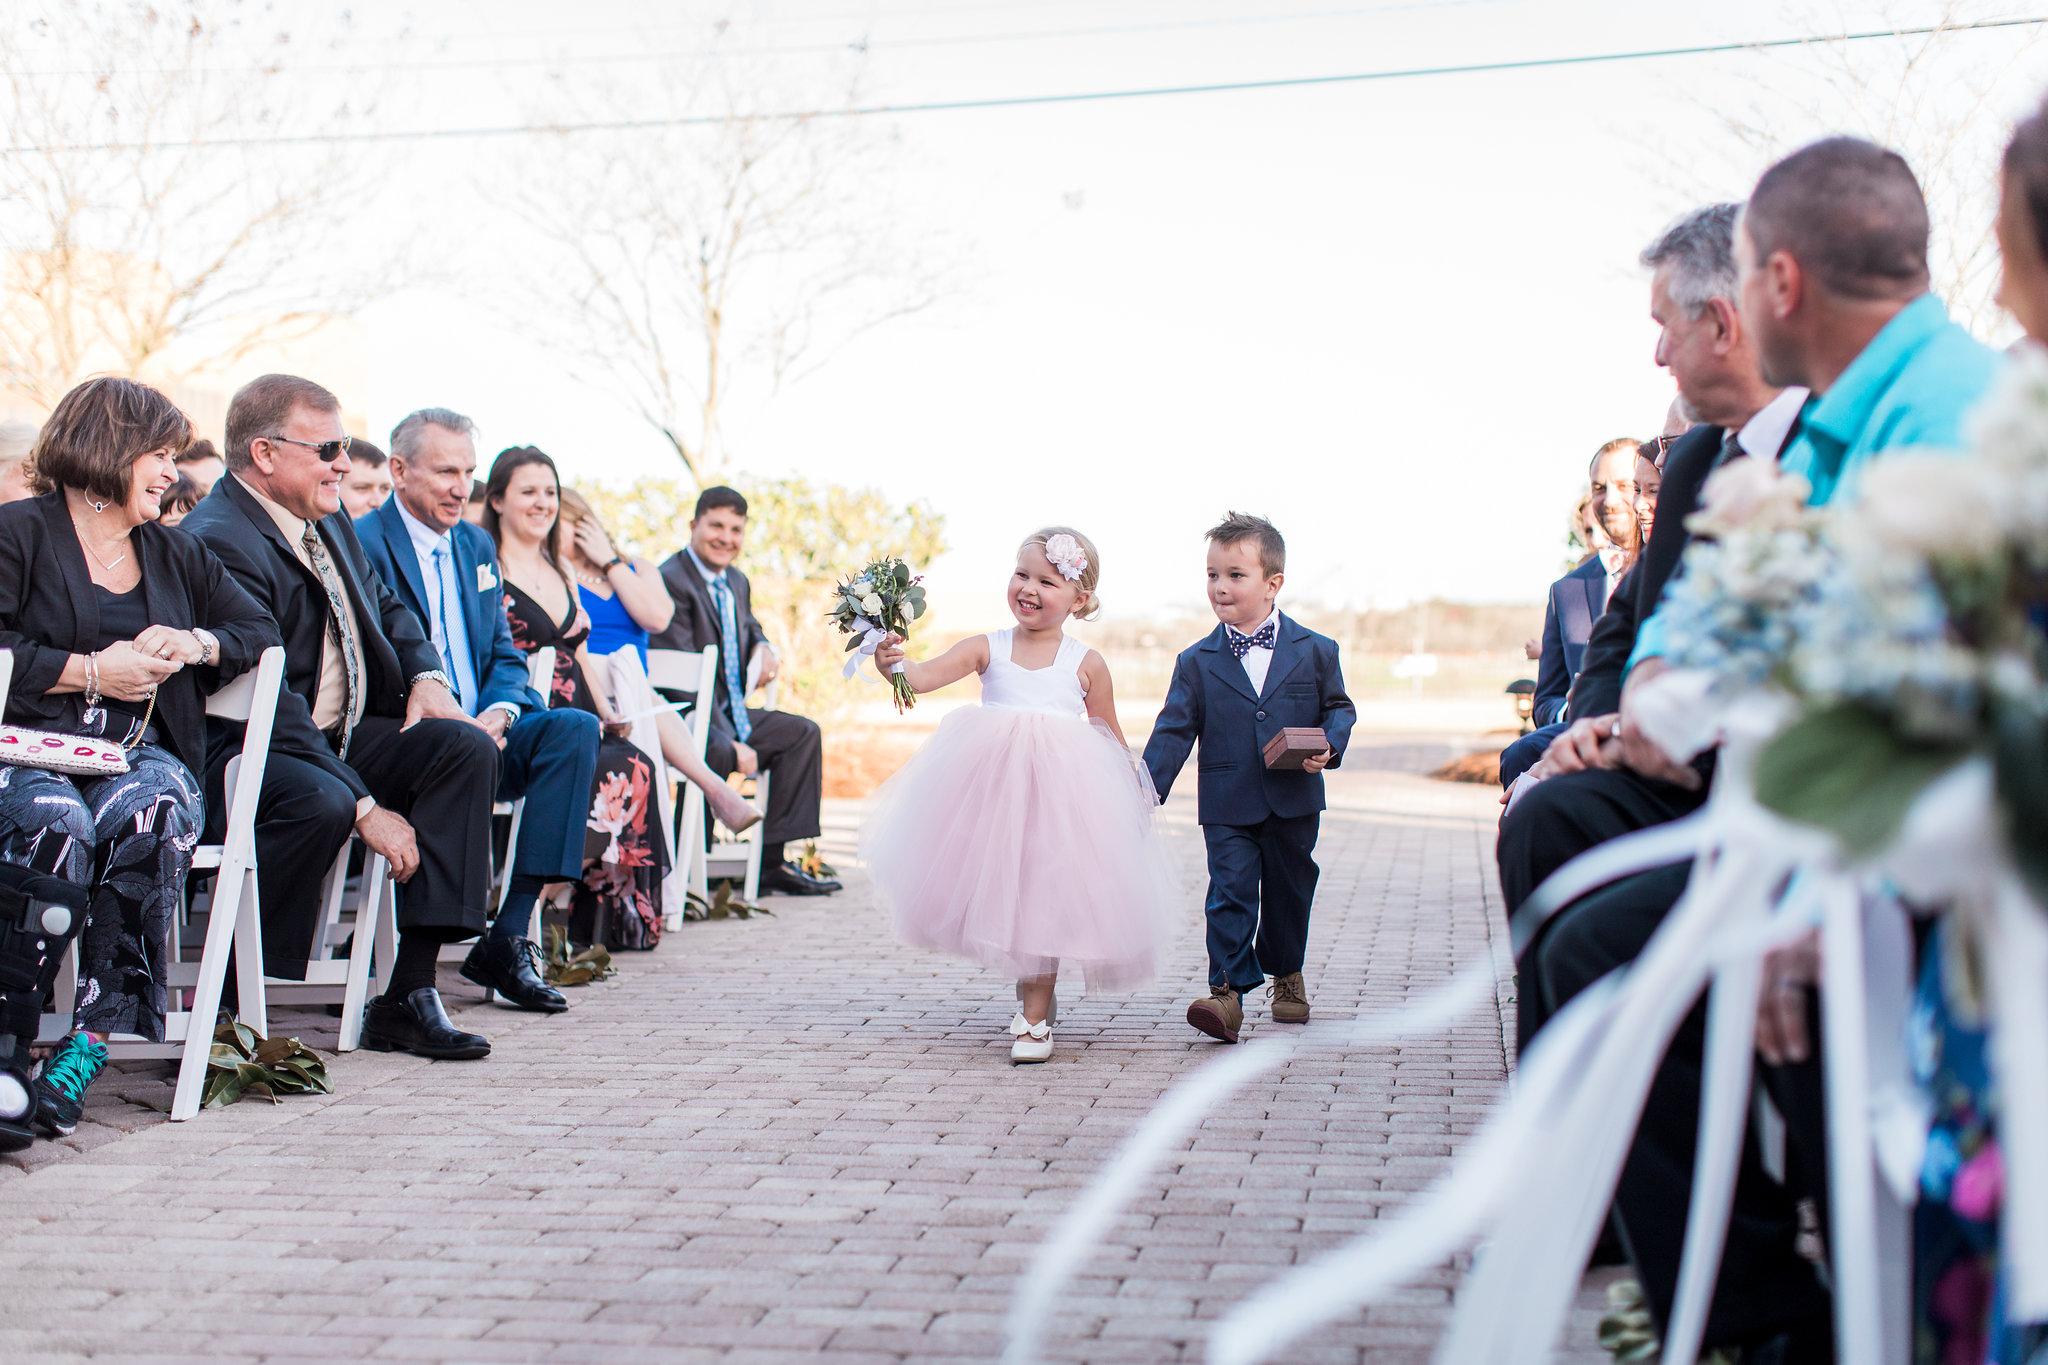 apt-b-photography-Savannah-wedding-photographer-savannah-engagement-photographer-historic-savannah-engagement-charles-h-morris-center-wedding-savannah-weddings-35.JPG